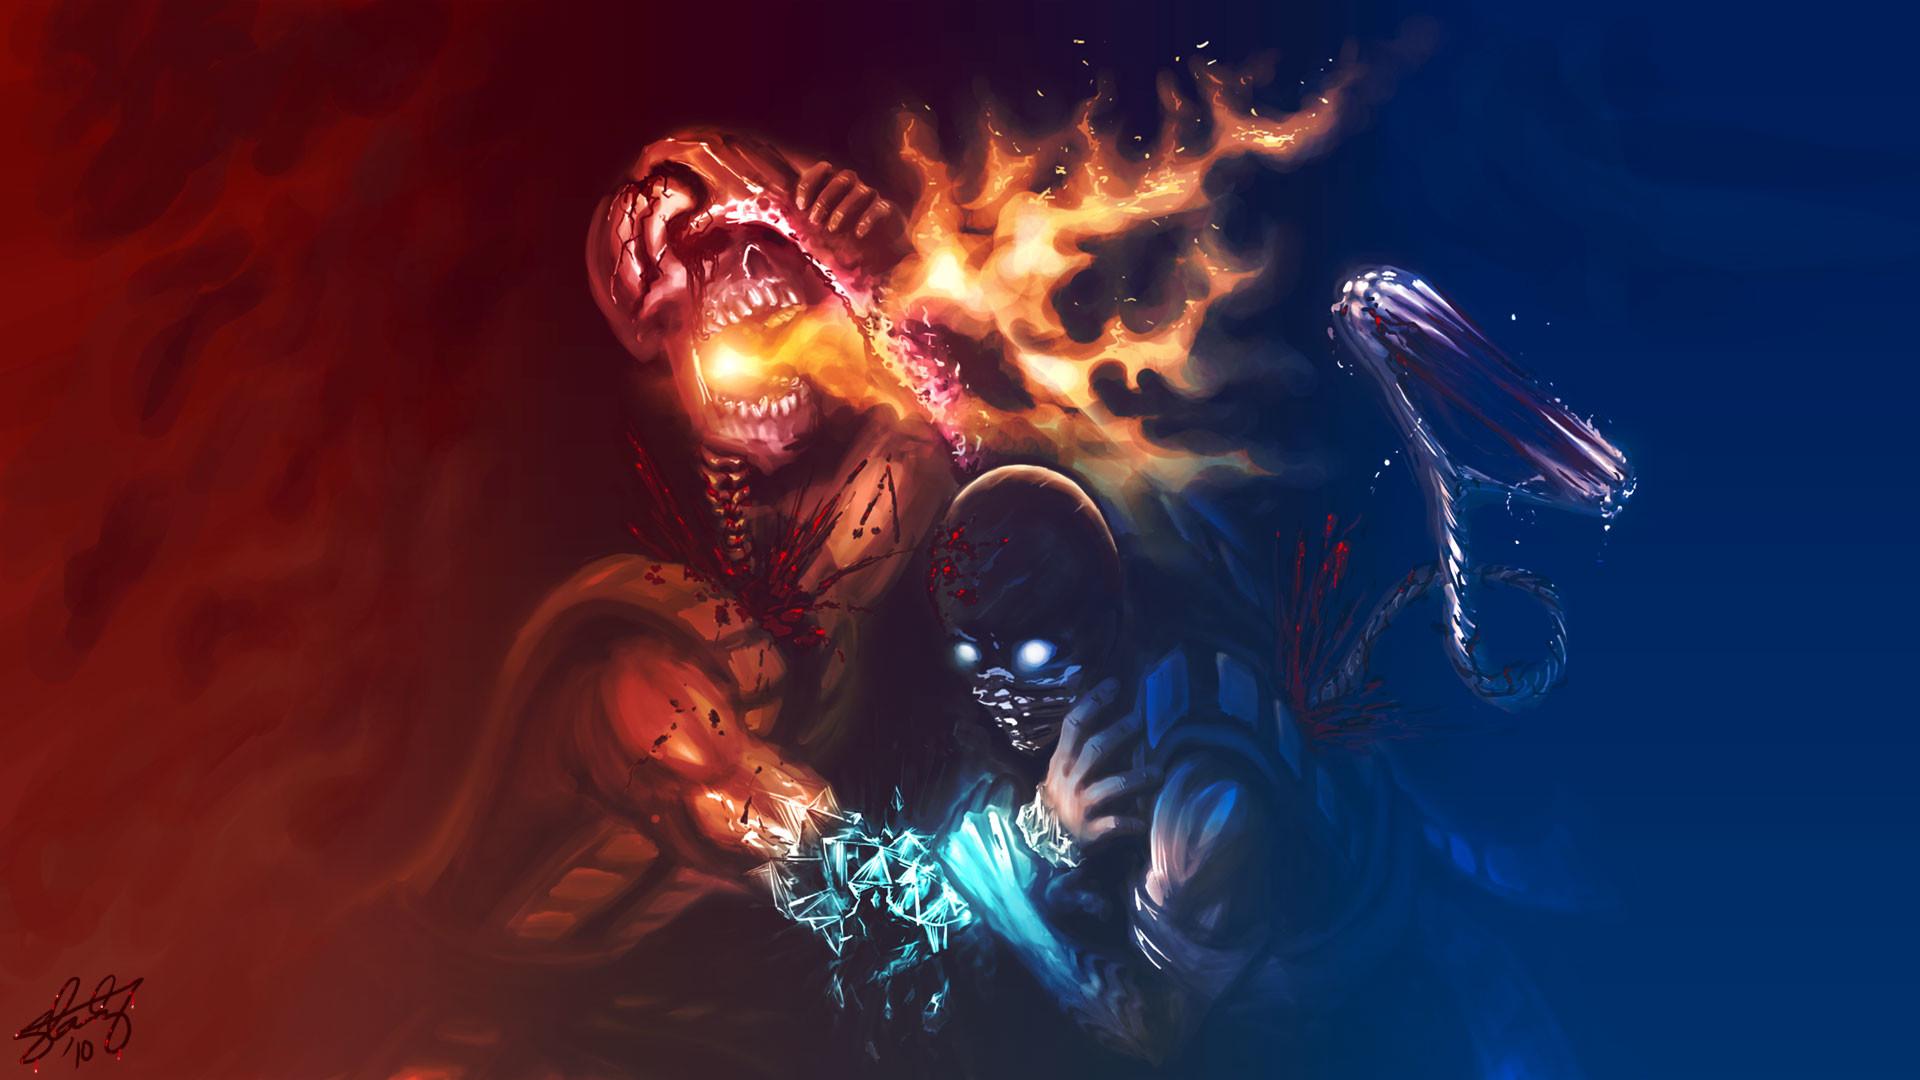 mortal kombat scorpion wallpaper hd